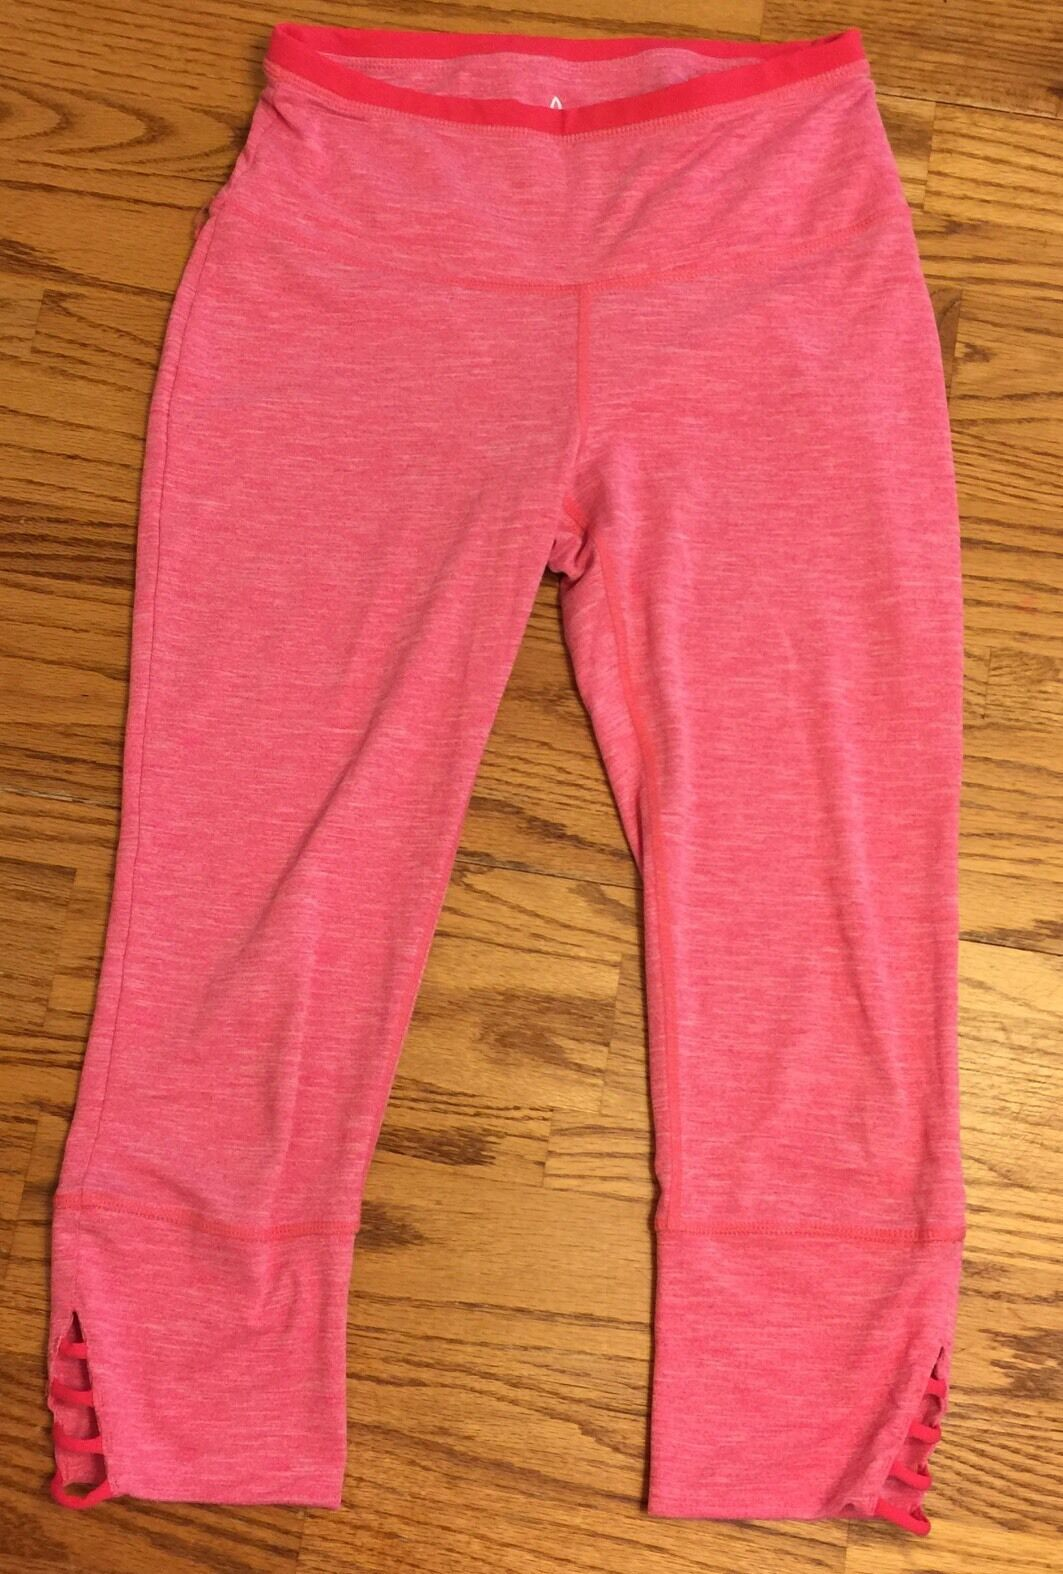 Pink PrAna Yoga Workout Capri Pants Size Small Stretch Rare Design Super Nice